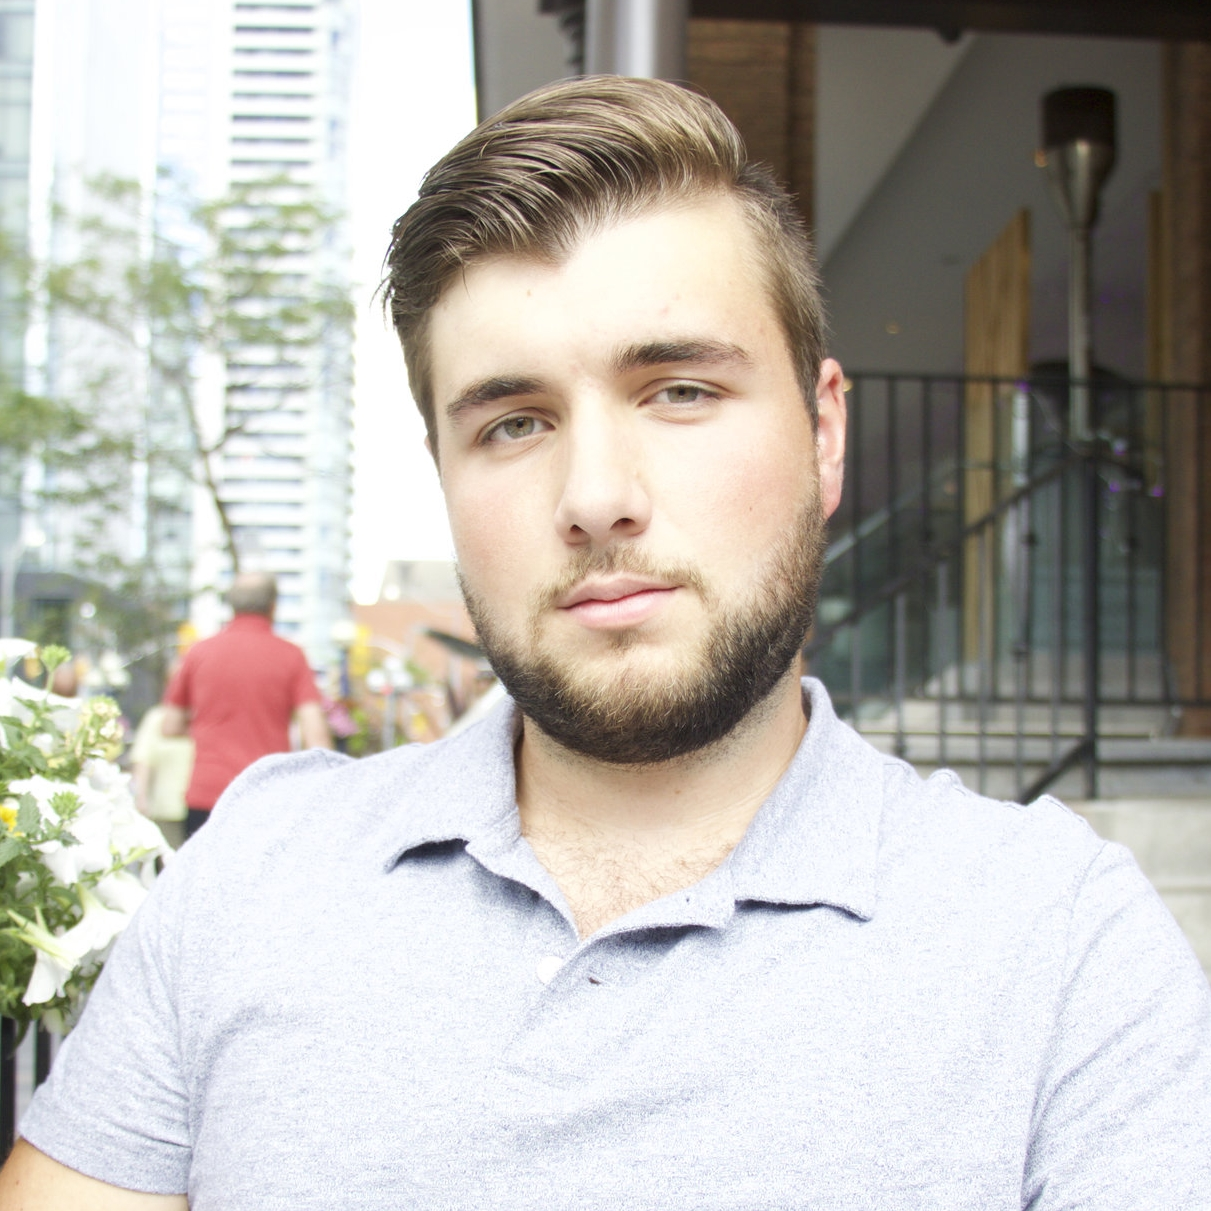 Darren Cabral  -Social media marketing expert, entrepreneur, blogger, and CEO of Suits Social Inc.